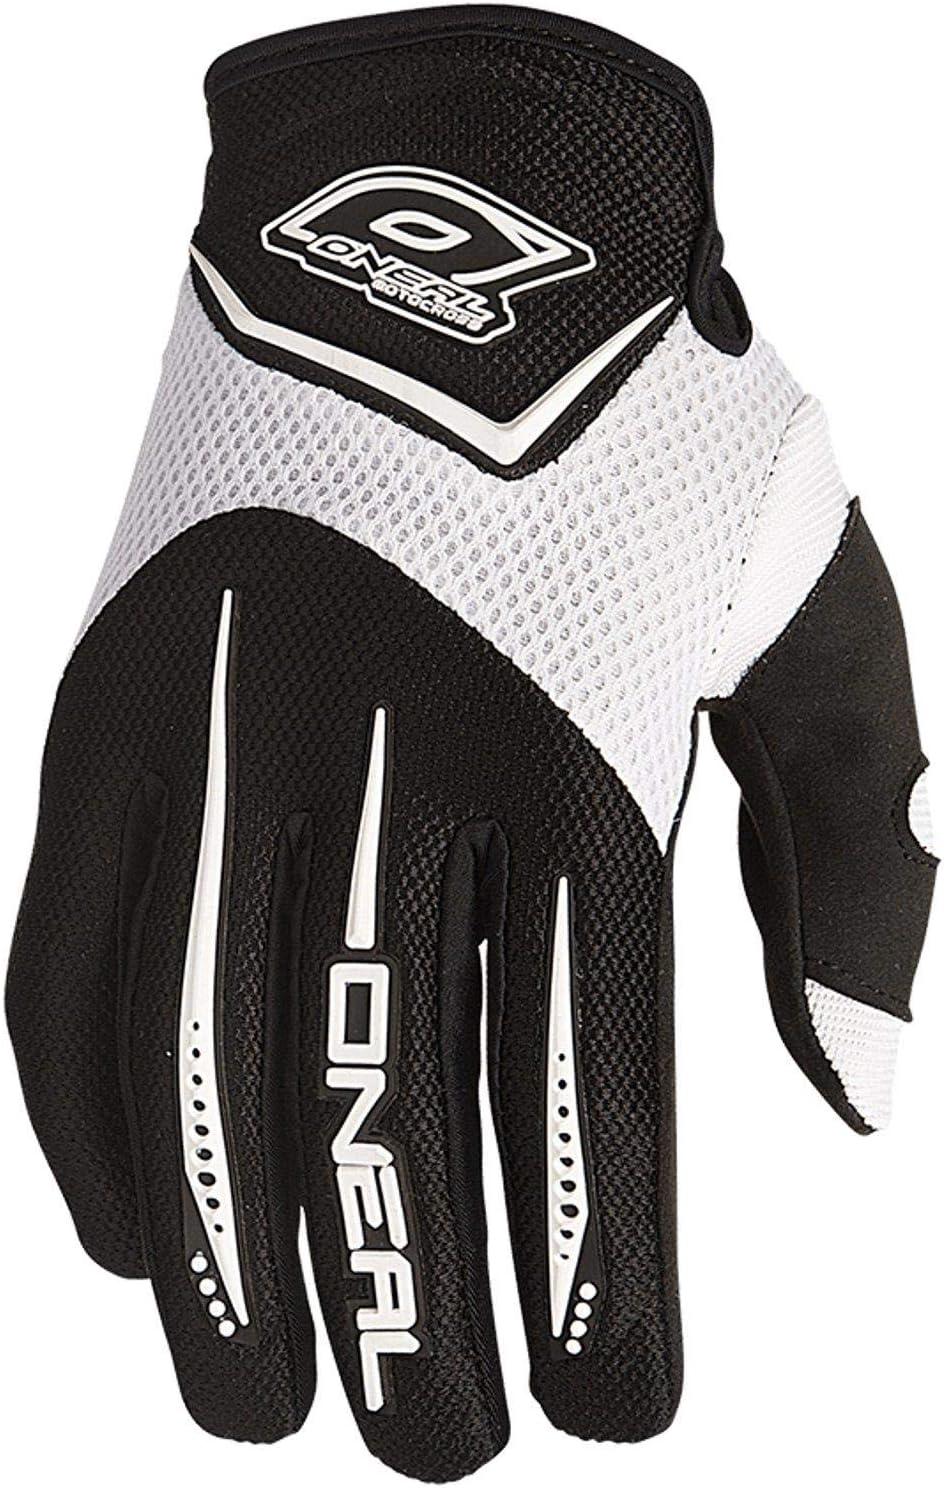 0399-2 ONeal Elemento MX DH Guanti Bianco Motocross Downhill Cross Moto Guanti